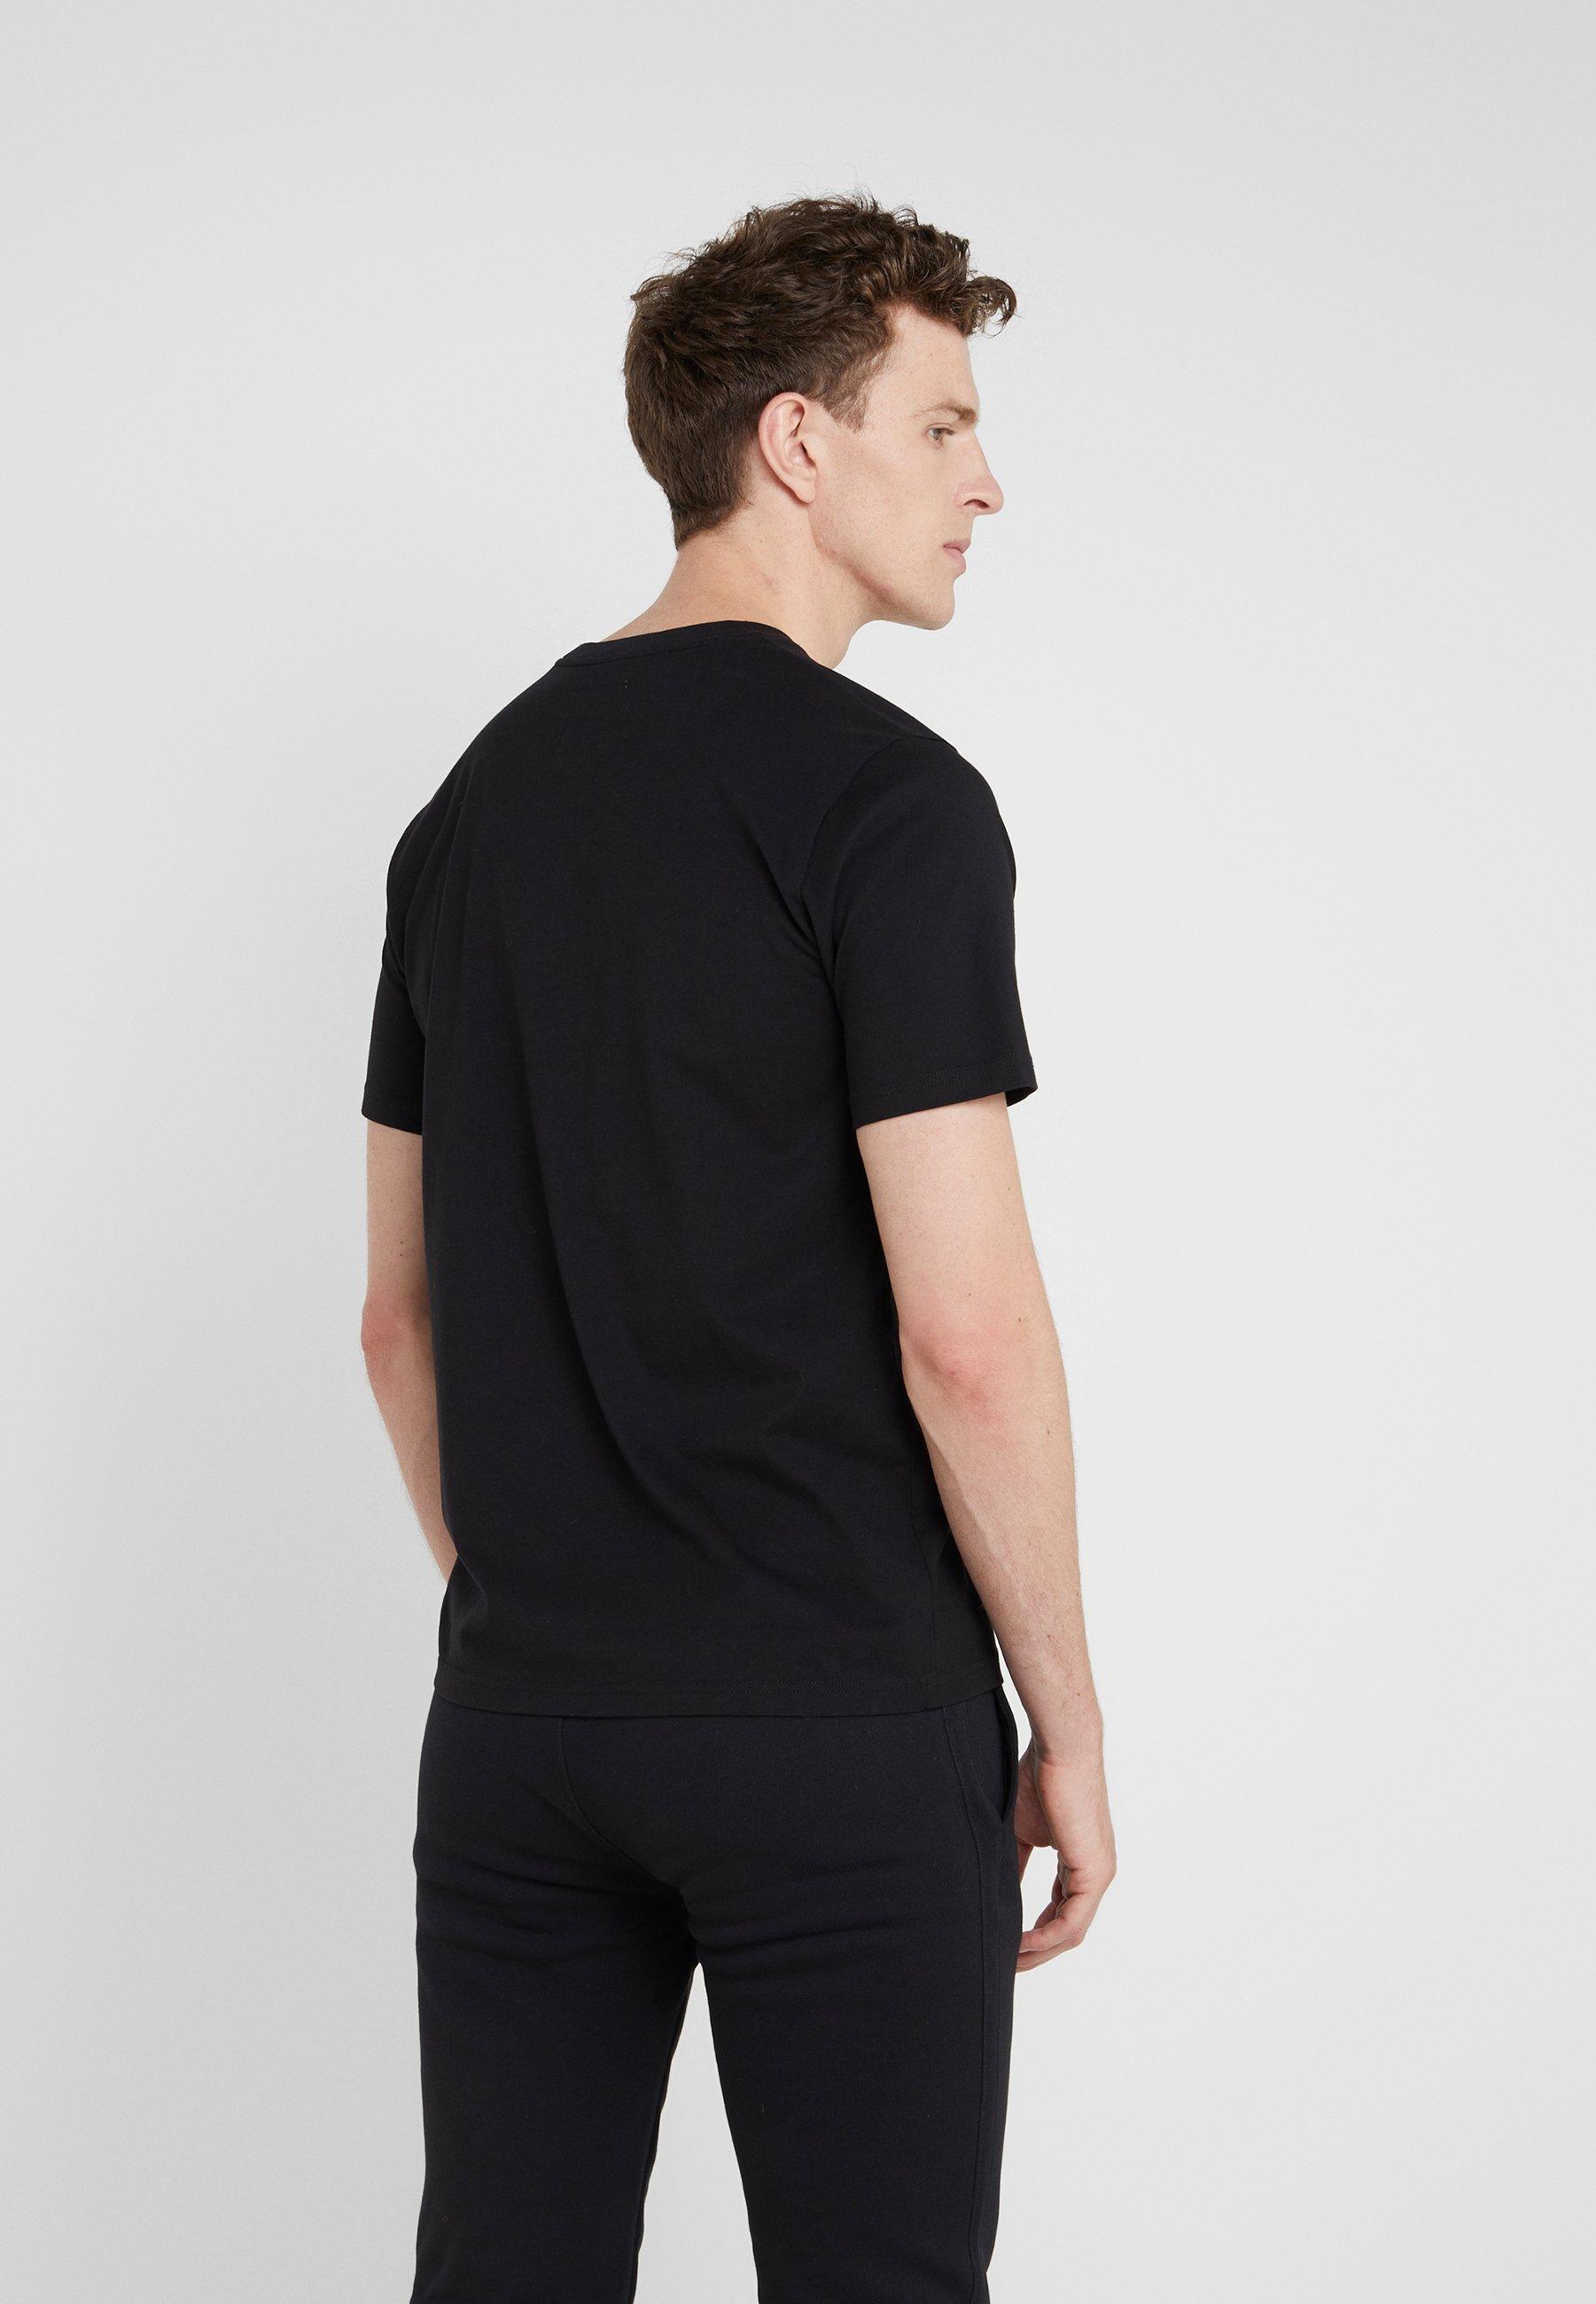 PEPPERT SMALL Shirt Bricktown print black v0OmNnyw8